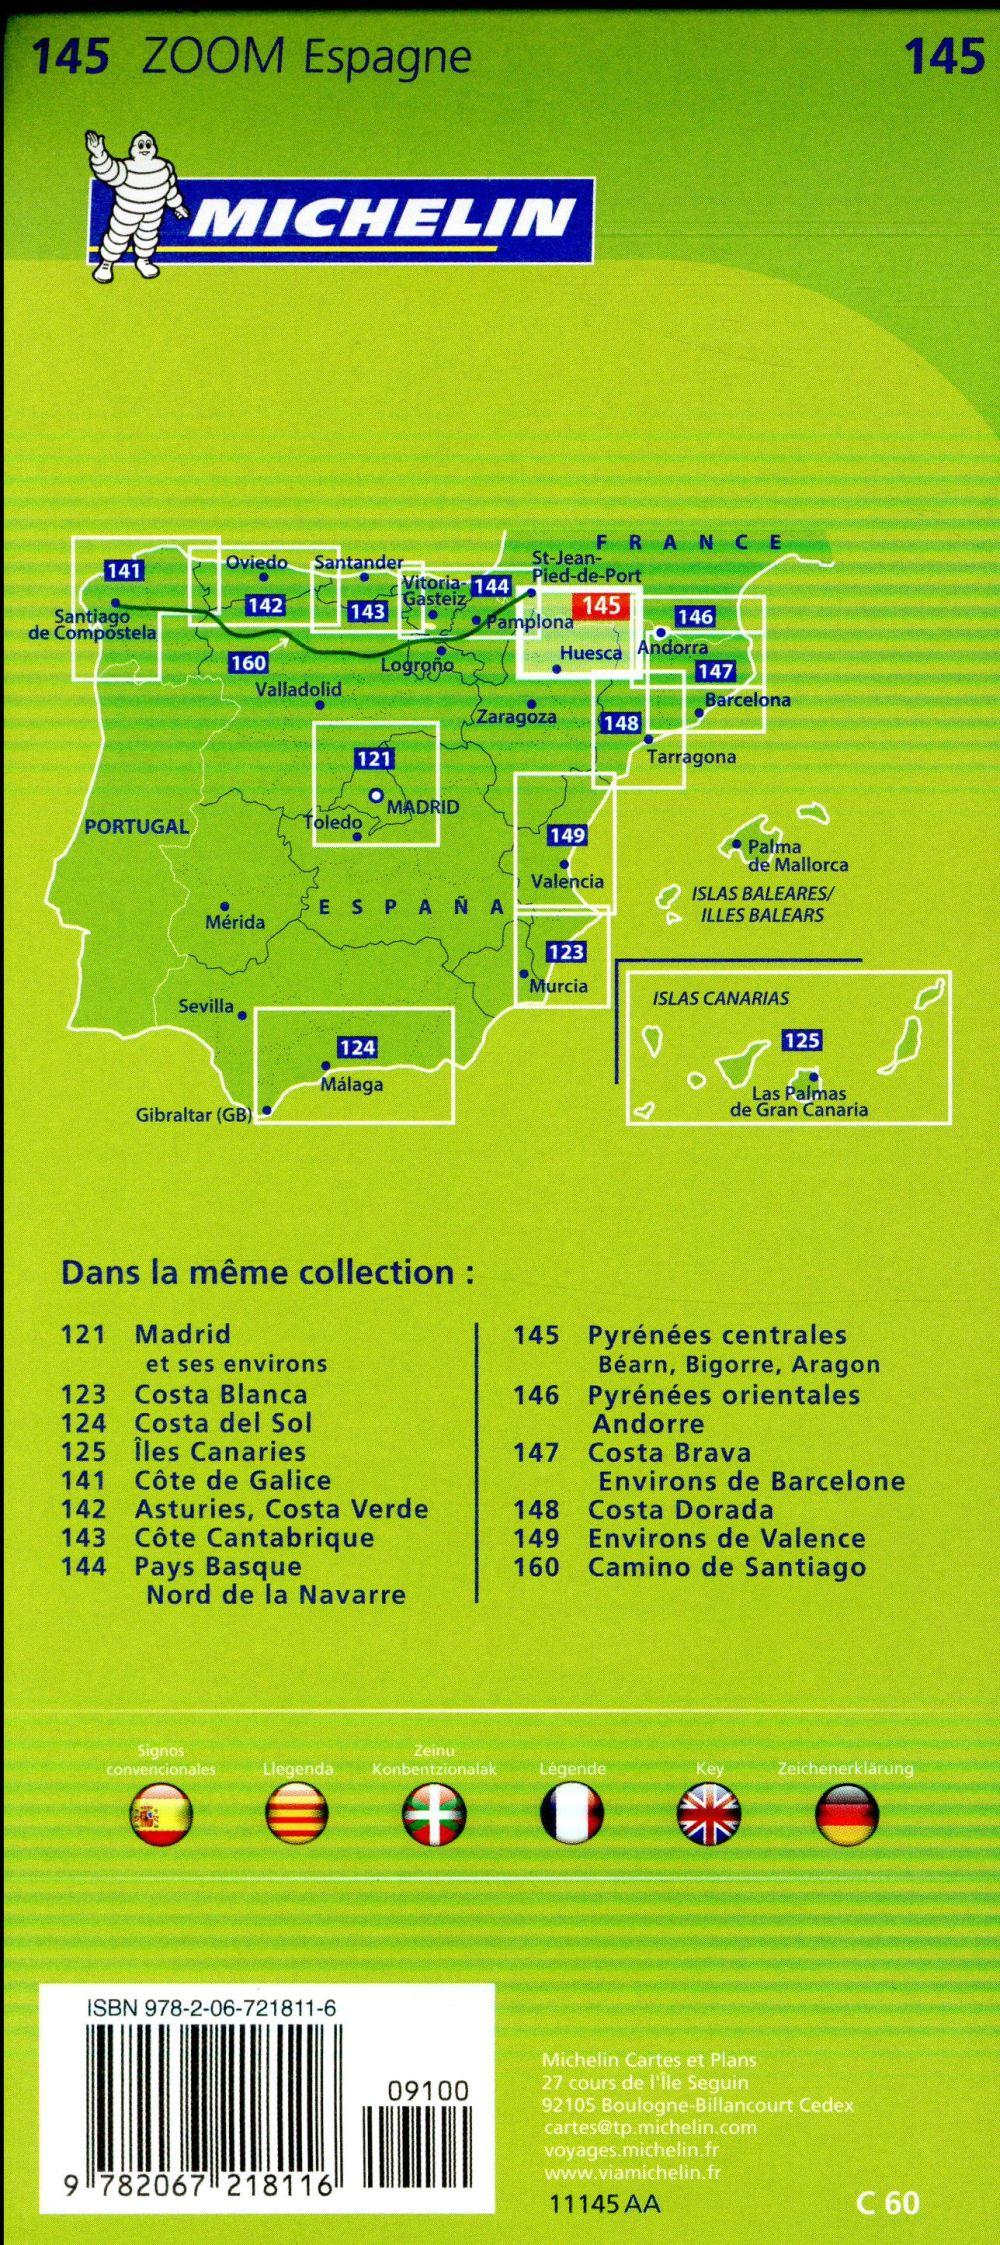 Pyrenées centrales ; Béarn, Bigorre, Aragon